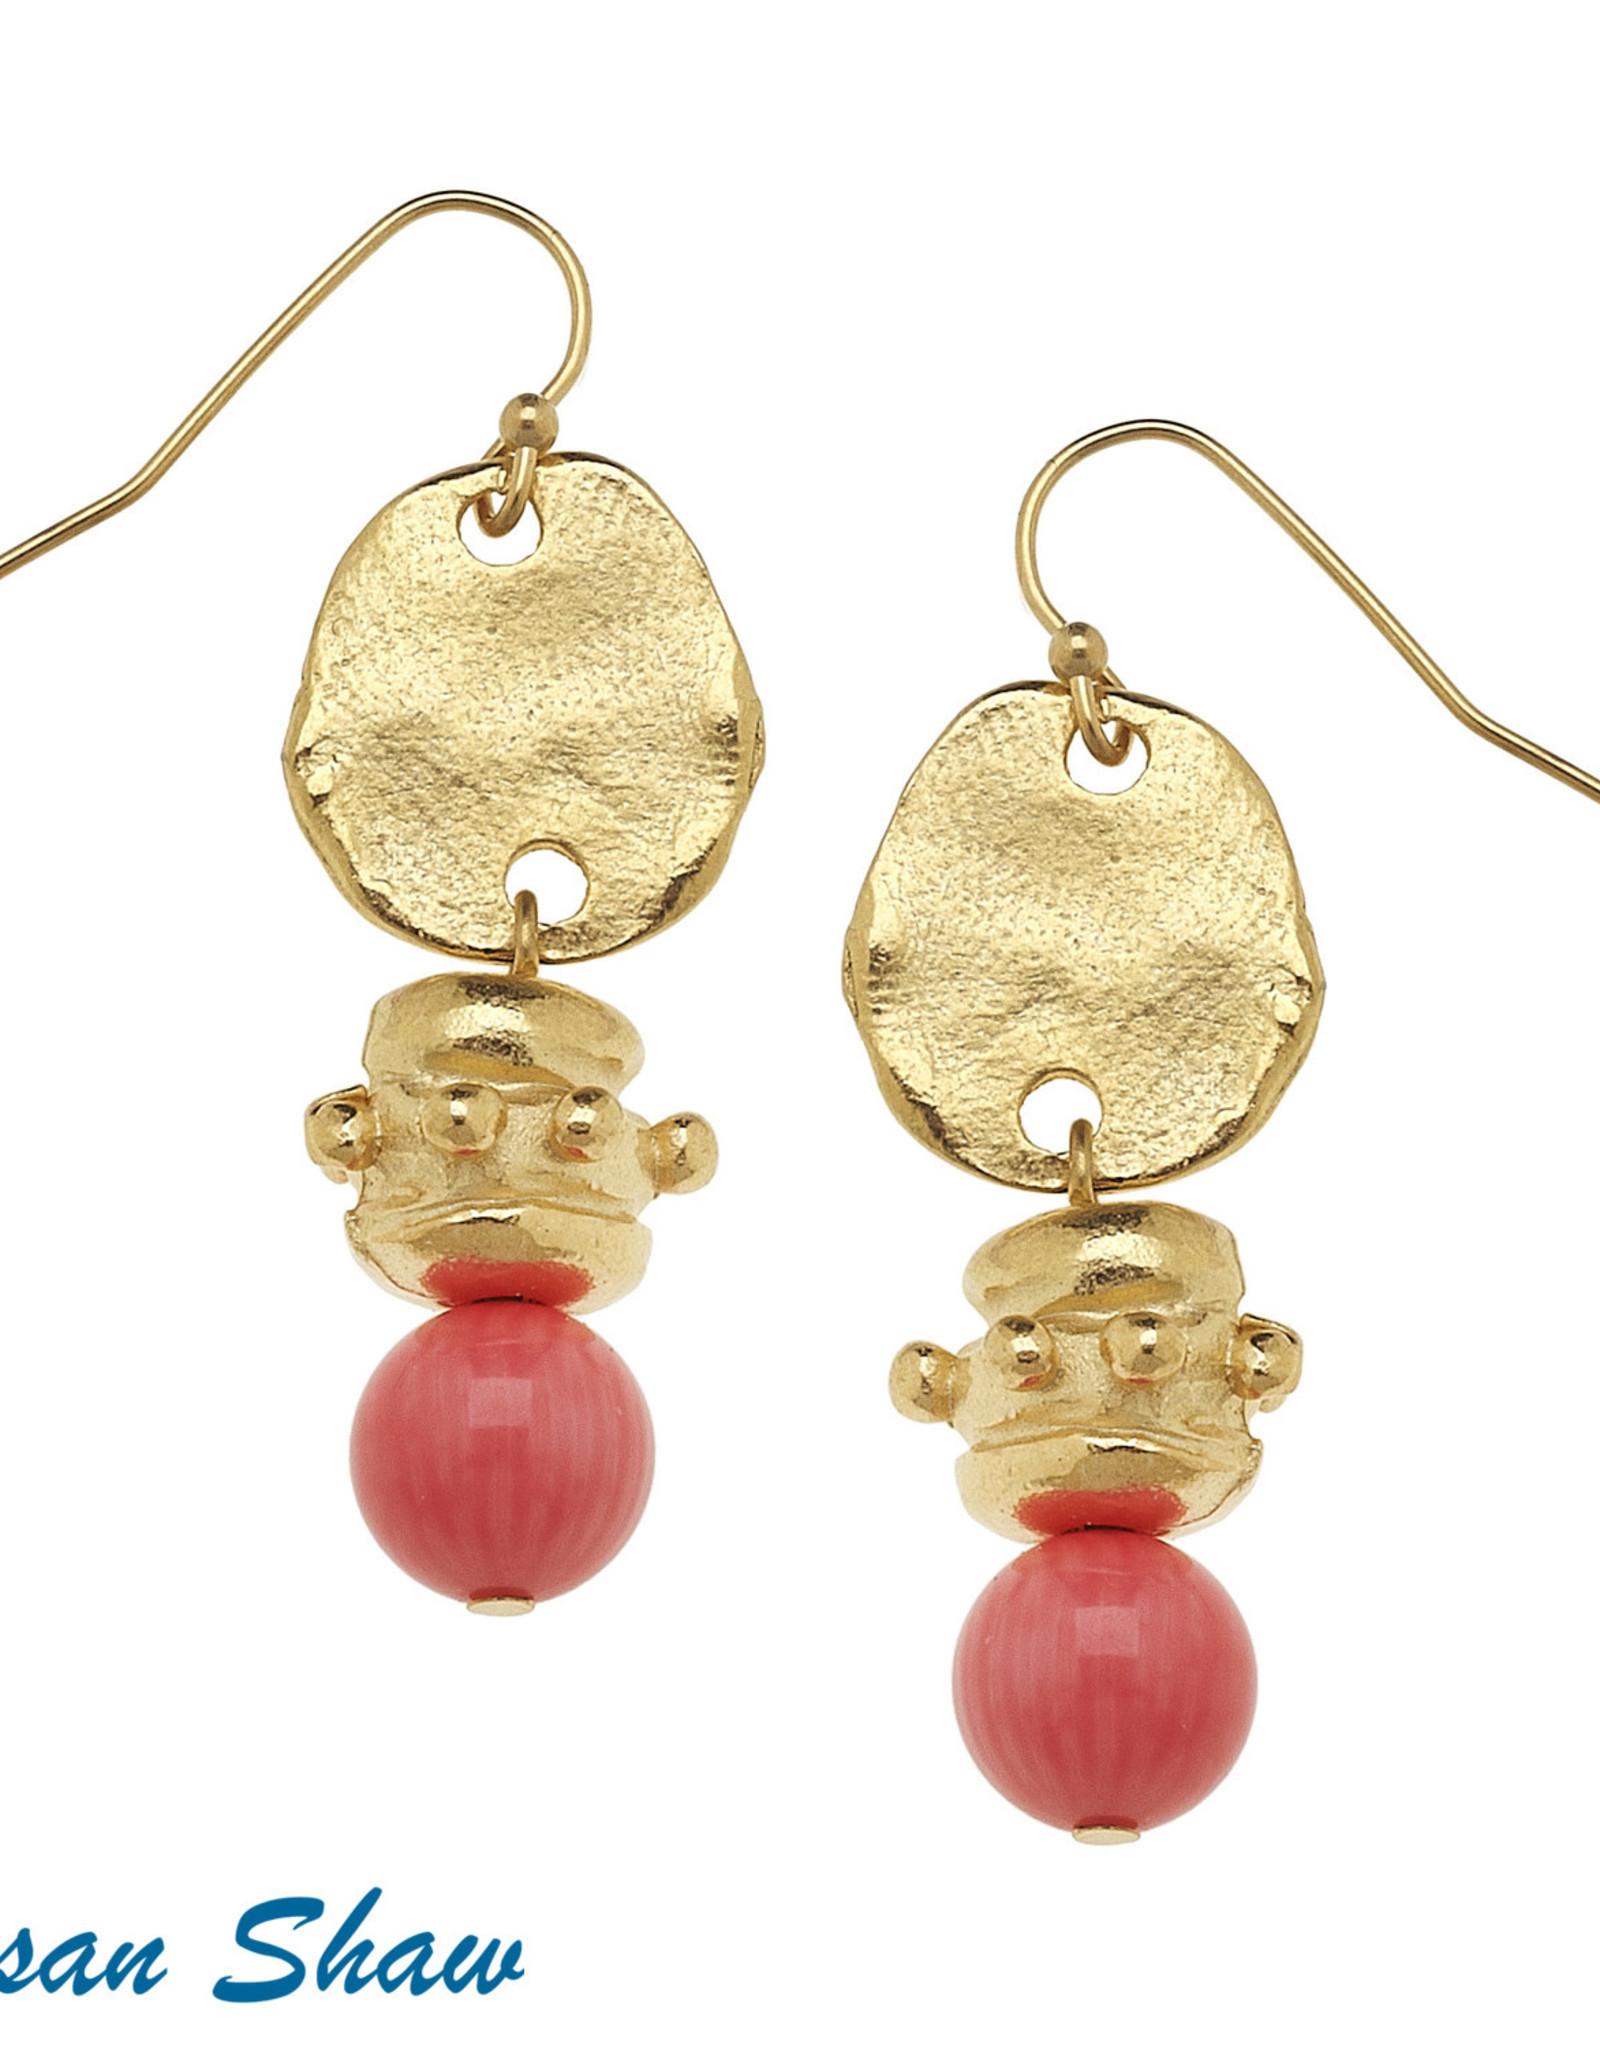 Susan Shaw Shaw Earrings GOLD Disc & Wire-hook/CORAL Quartz Drop